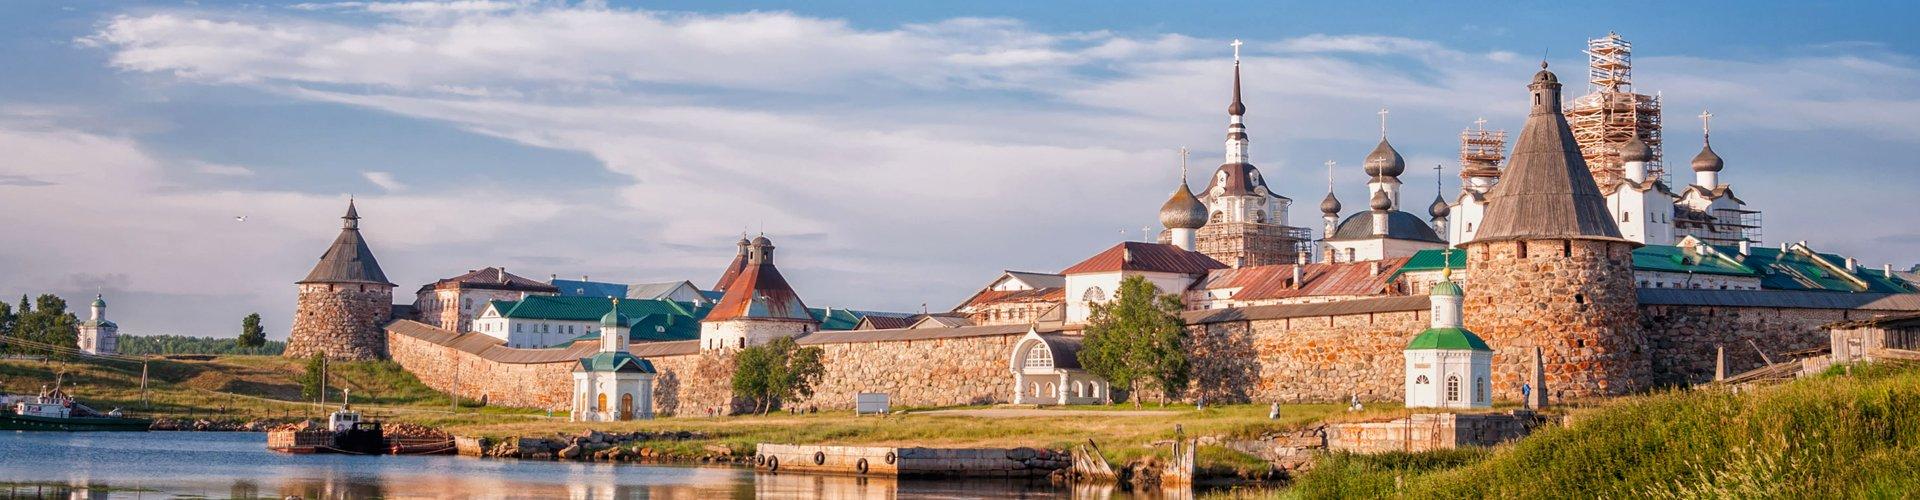 Solovetski-eilanden, Rusland